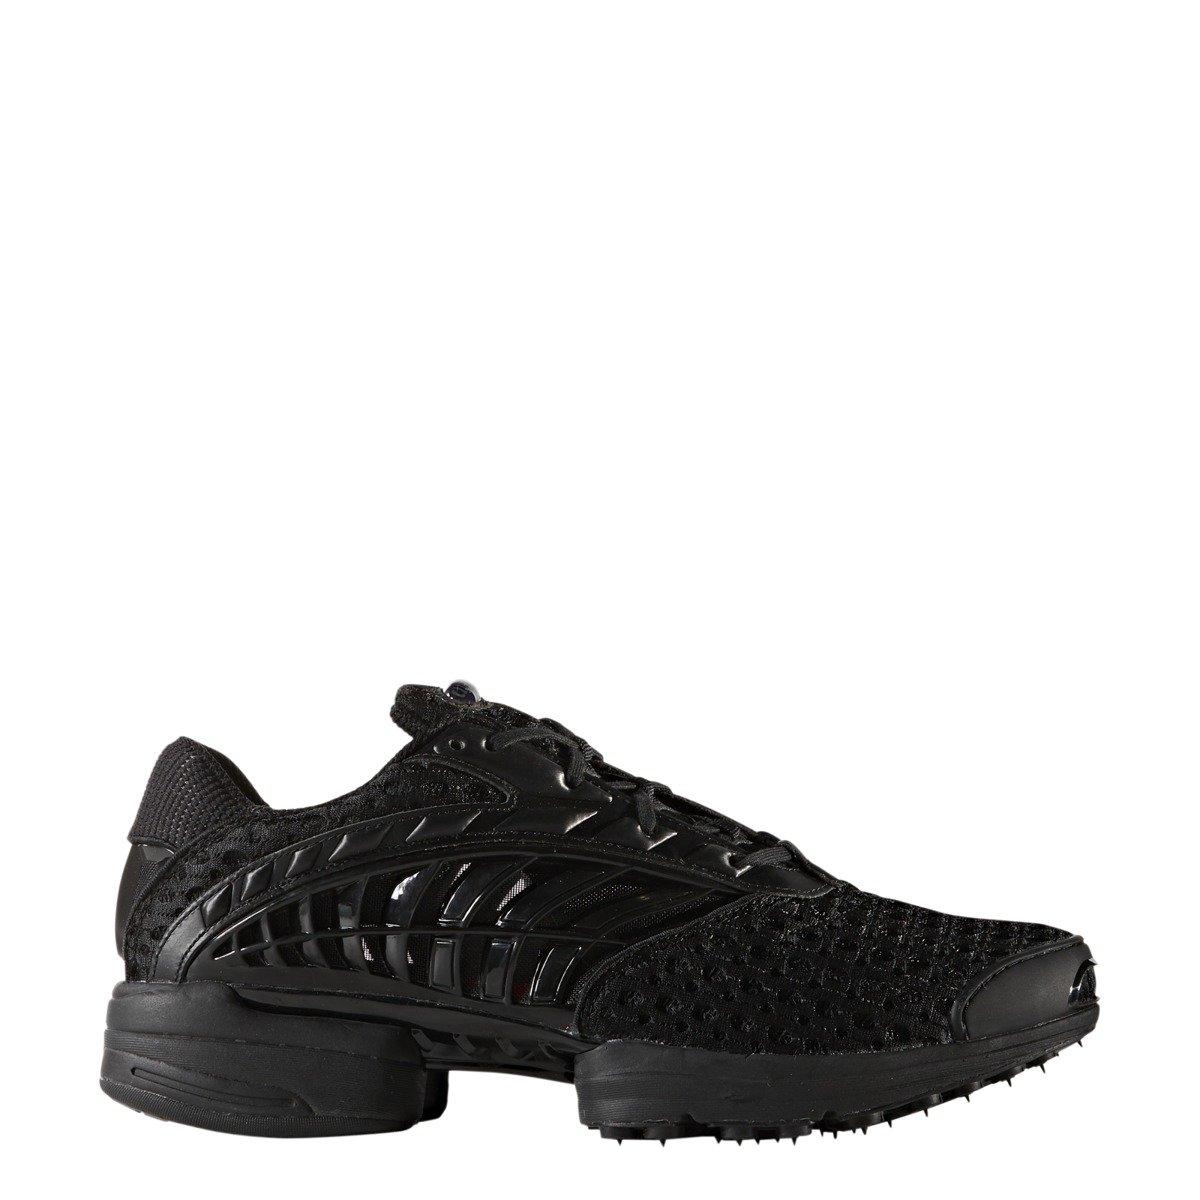 2 Schuhe Climacool Adidas By3009Basketballschuhe FcTK1J3l